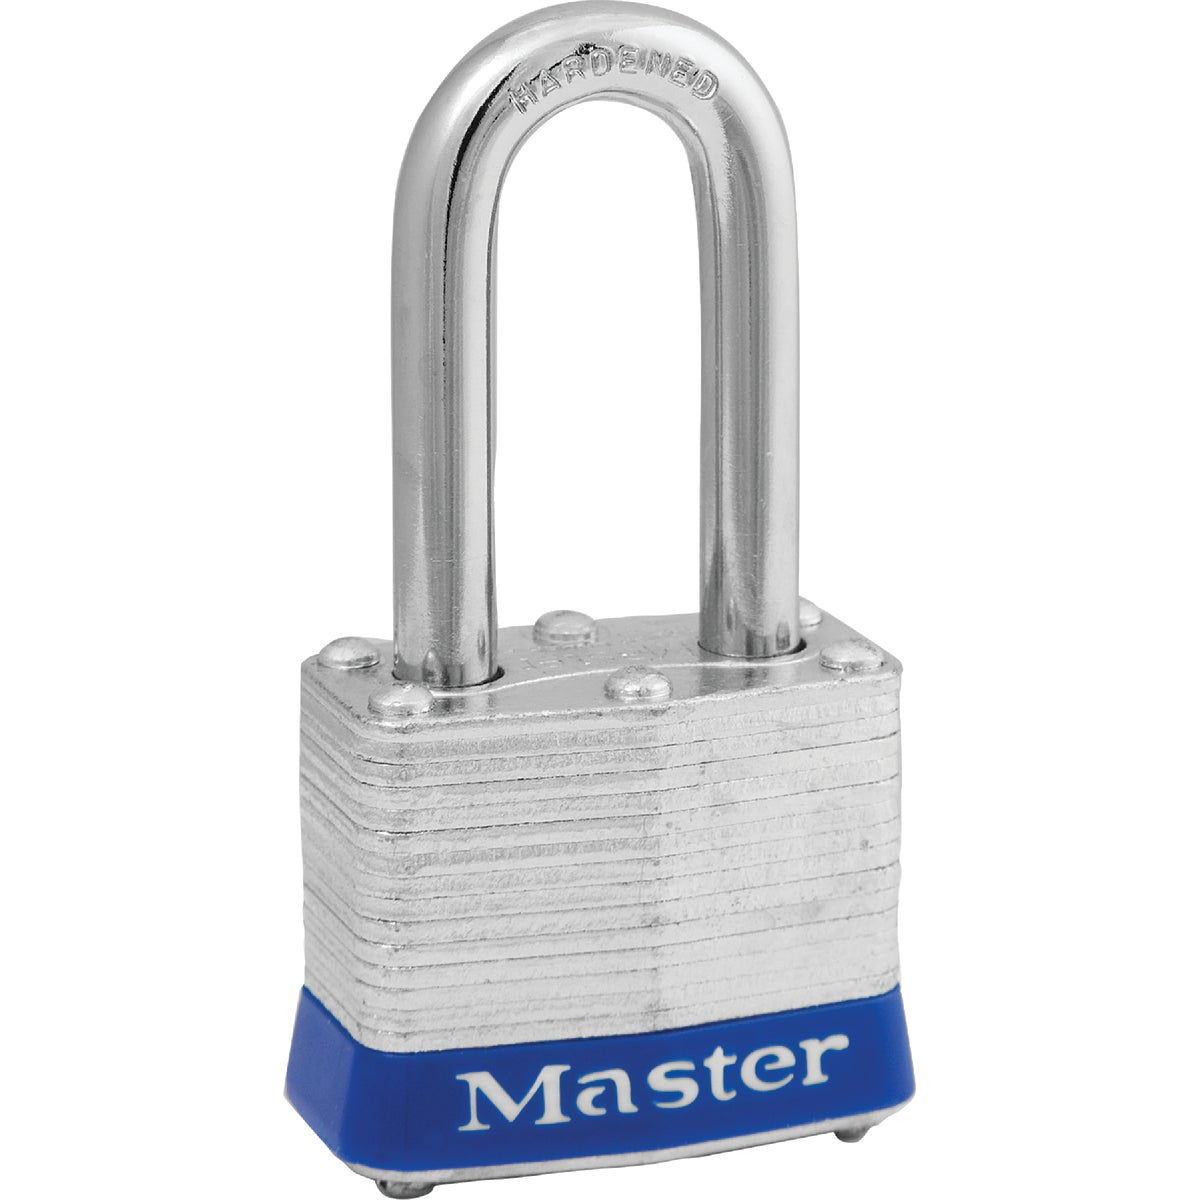 UNIVERSAL PIN PADLOCK - 3UPLF by Master Lock Company